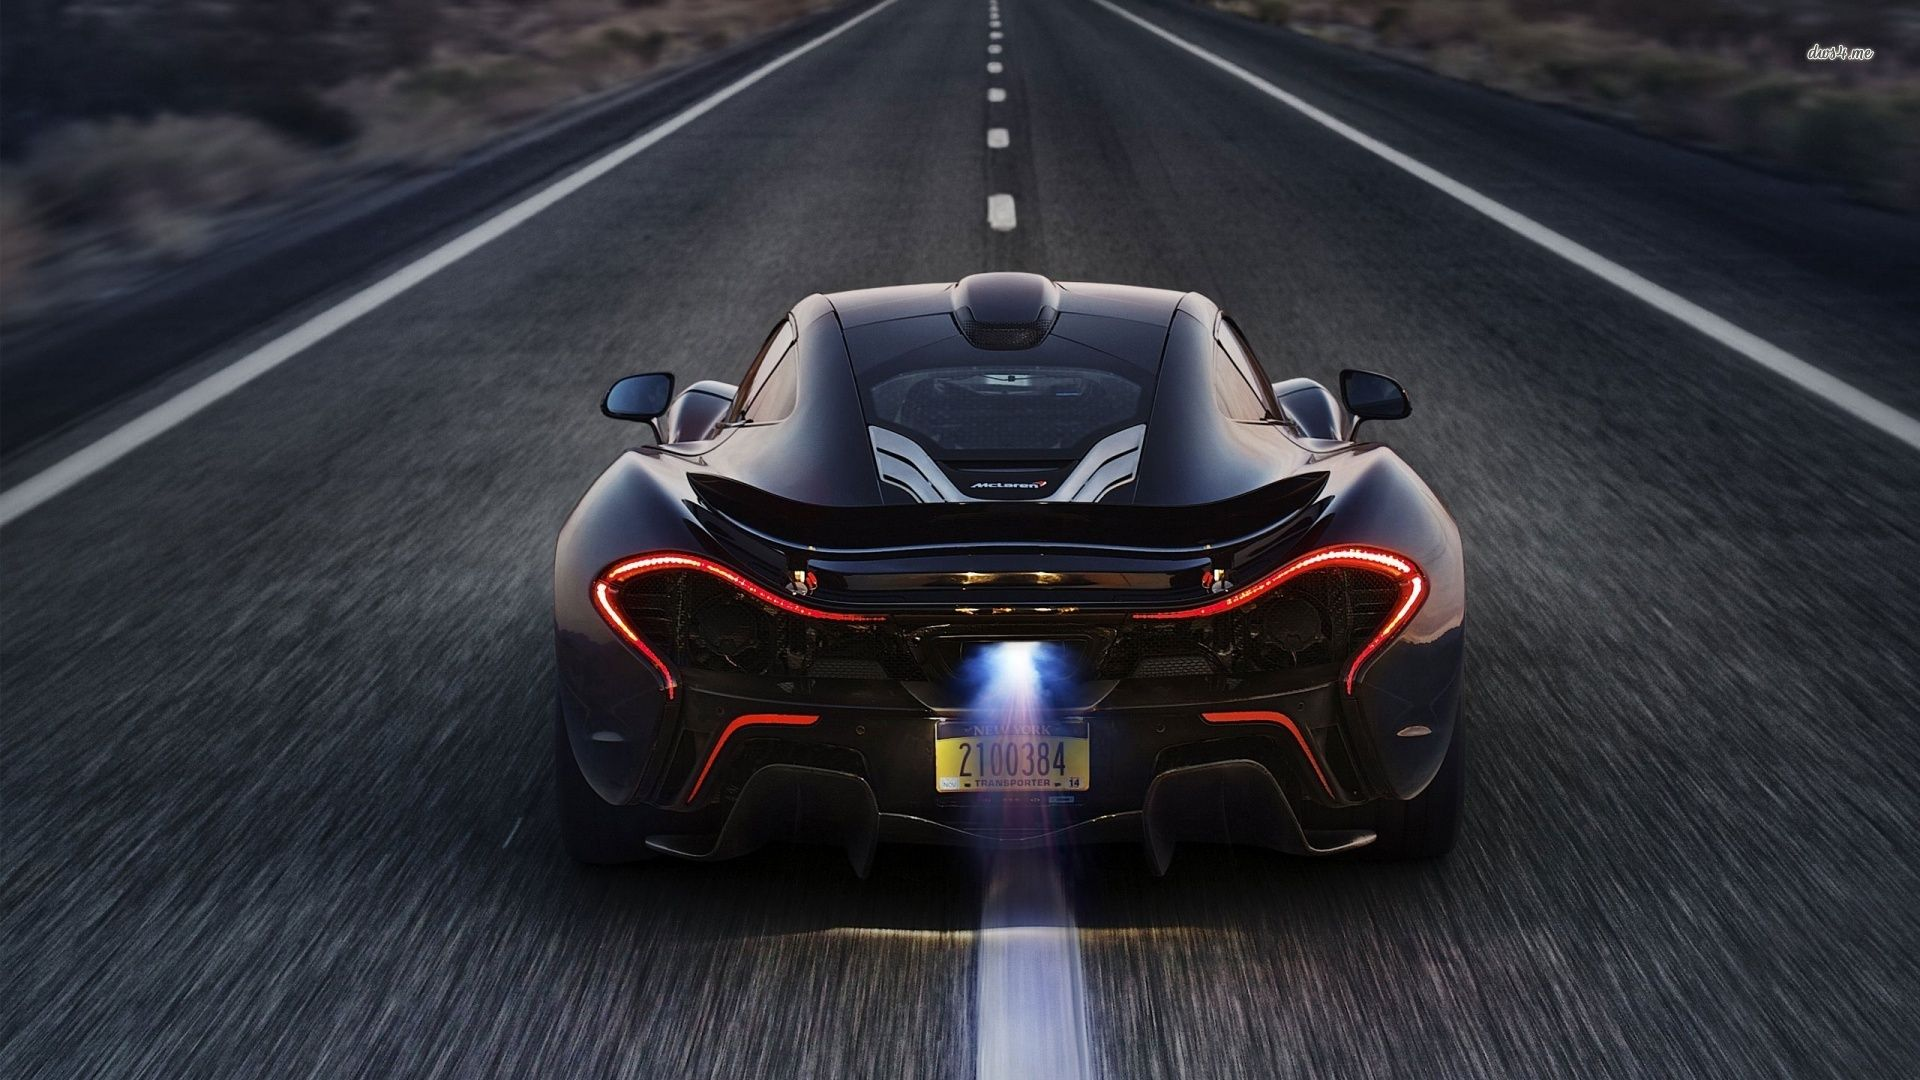 Mclaren P1 Hd Wallpaper Super Cars Fast Cars Mclaren P1